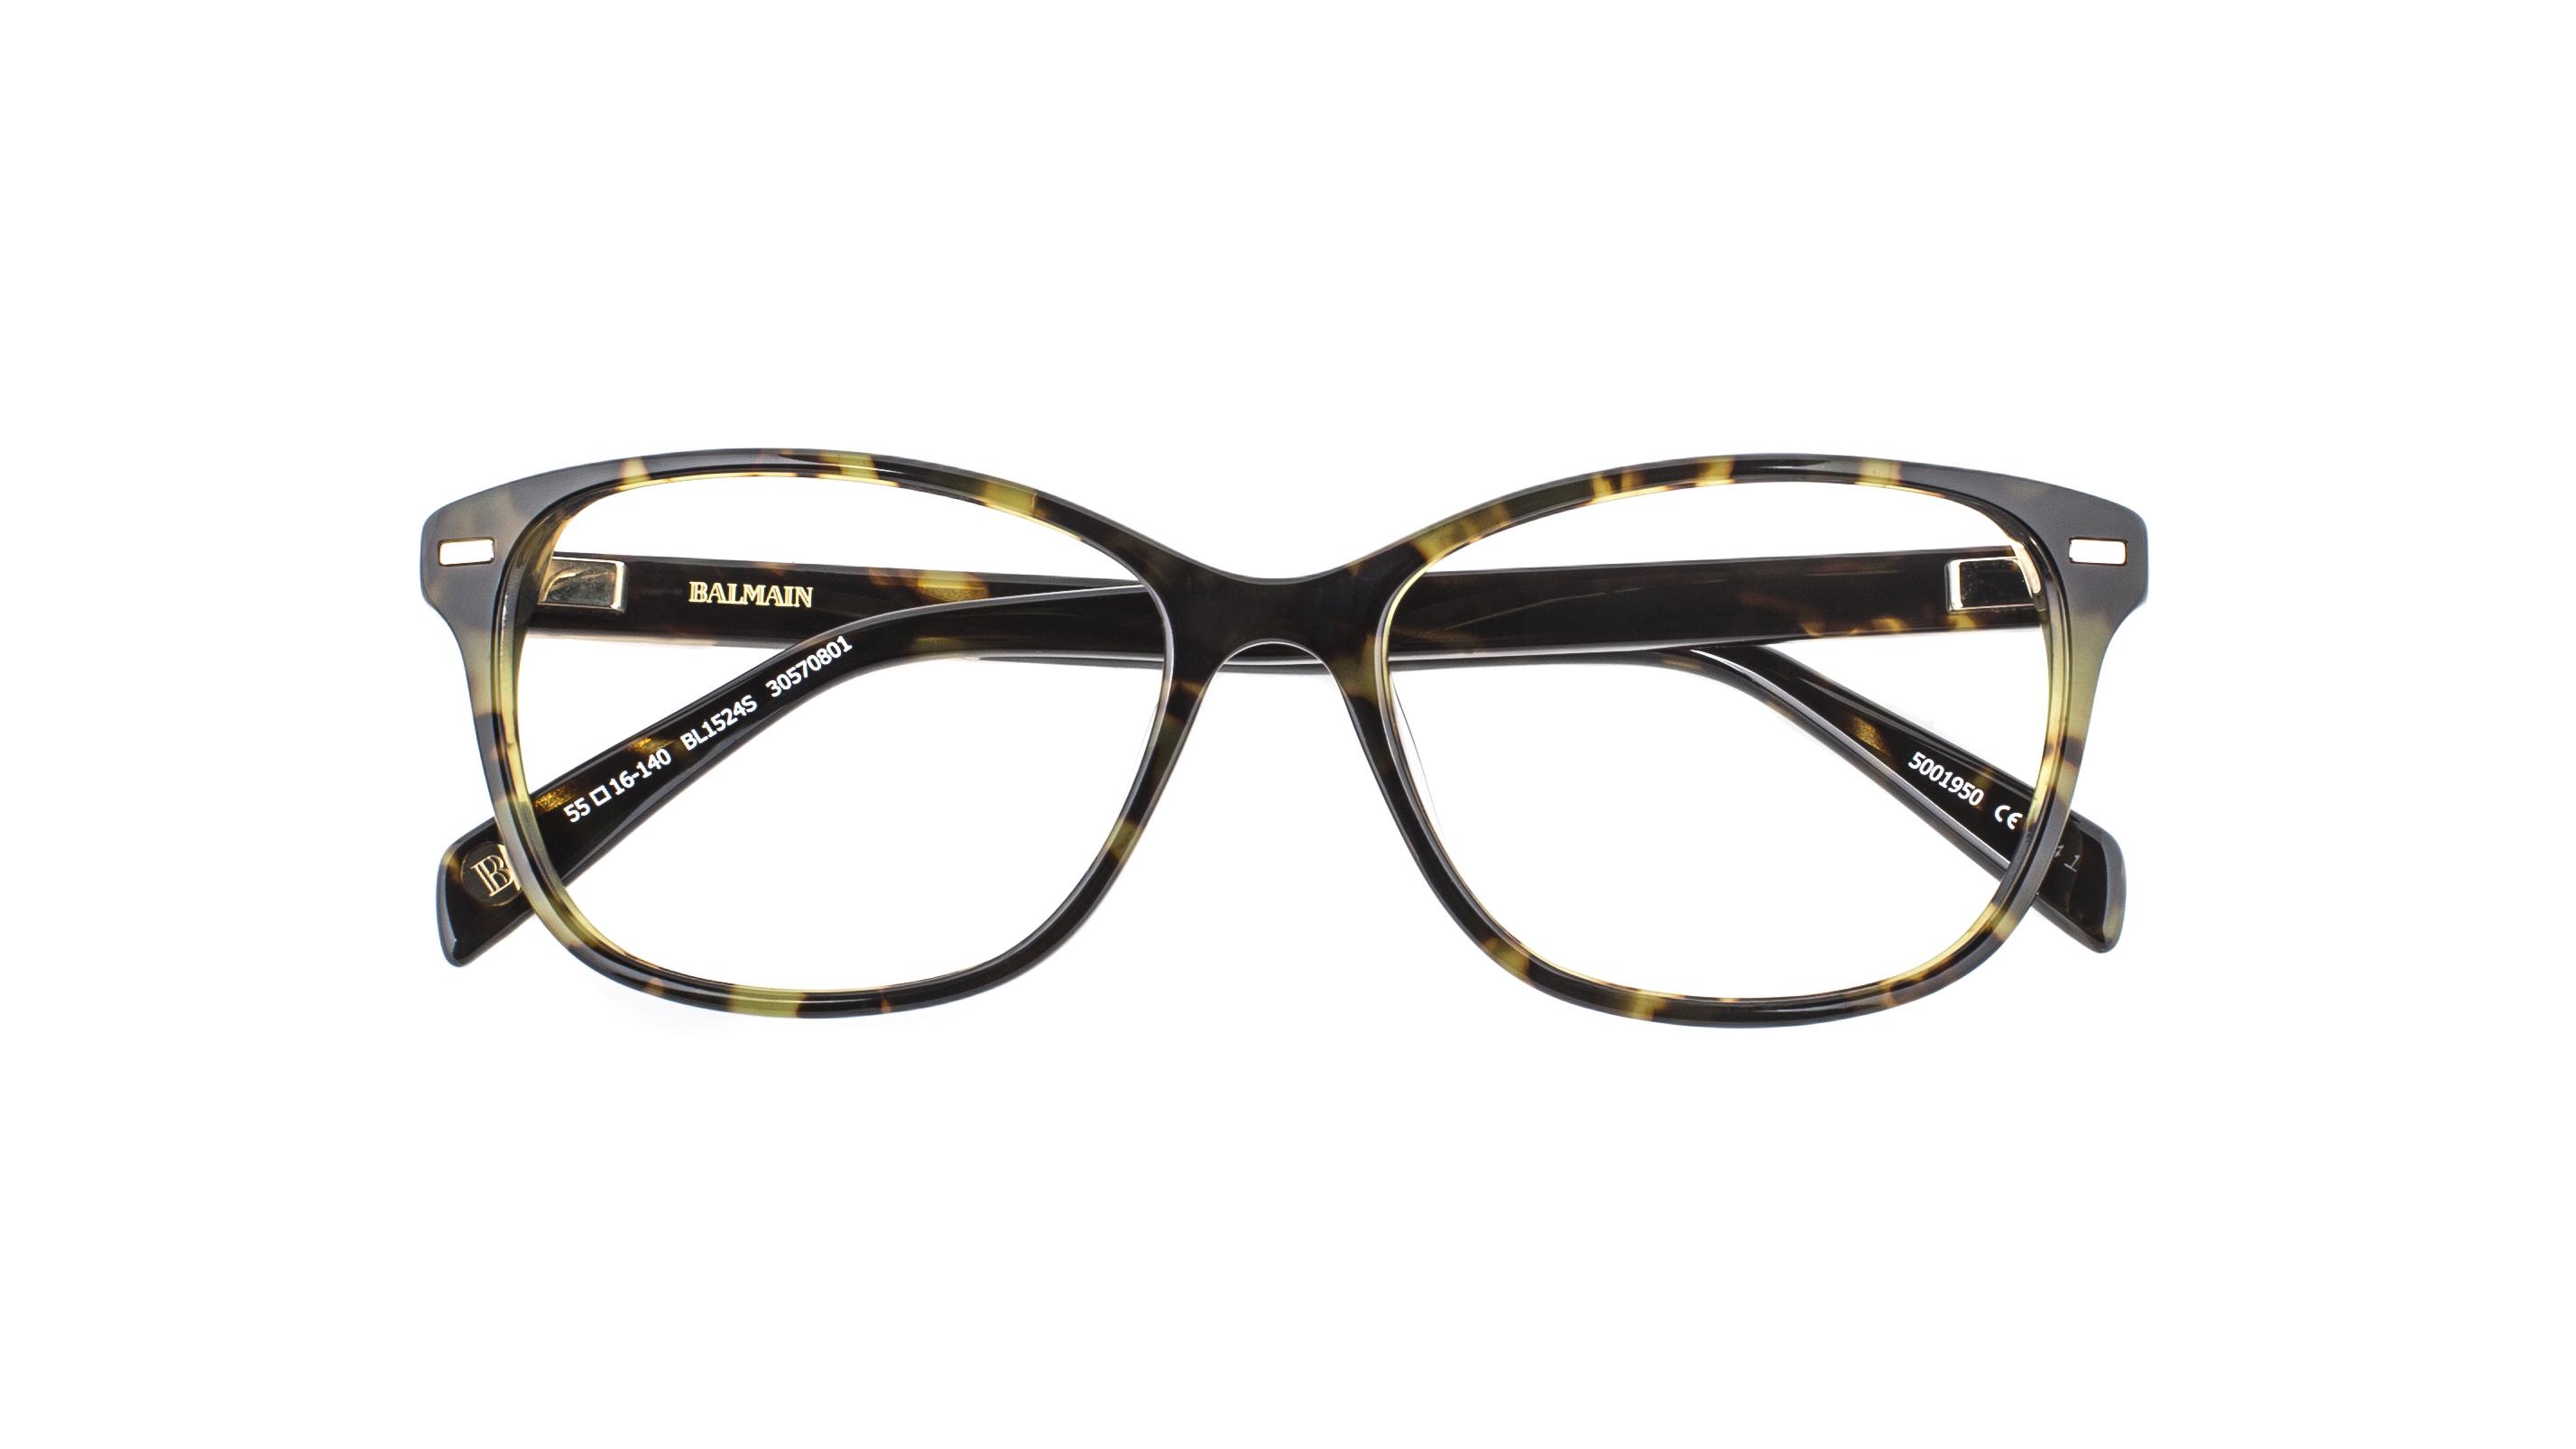 Balmain x Specsavers BL1524S 30570801 - RRP 2 pairs single vision $459